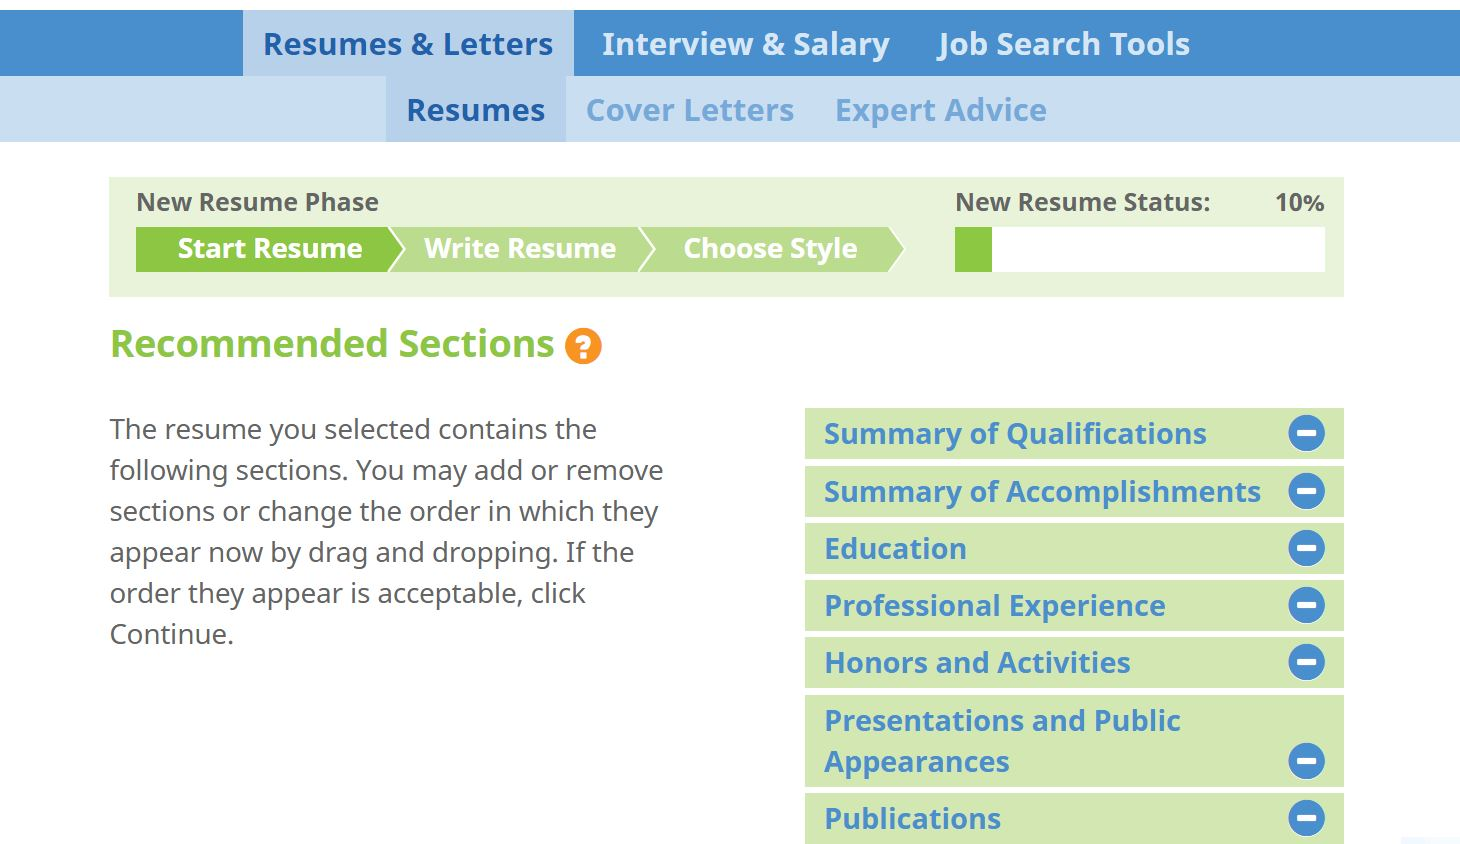 Job Search & Business Card Software, ResumeMakerPro Web - Annual Subscription Screenshot